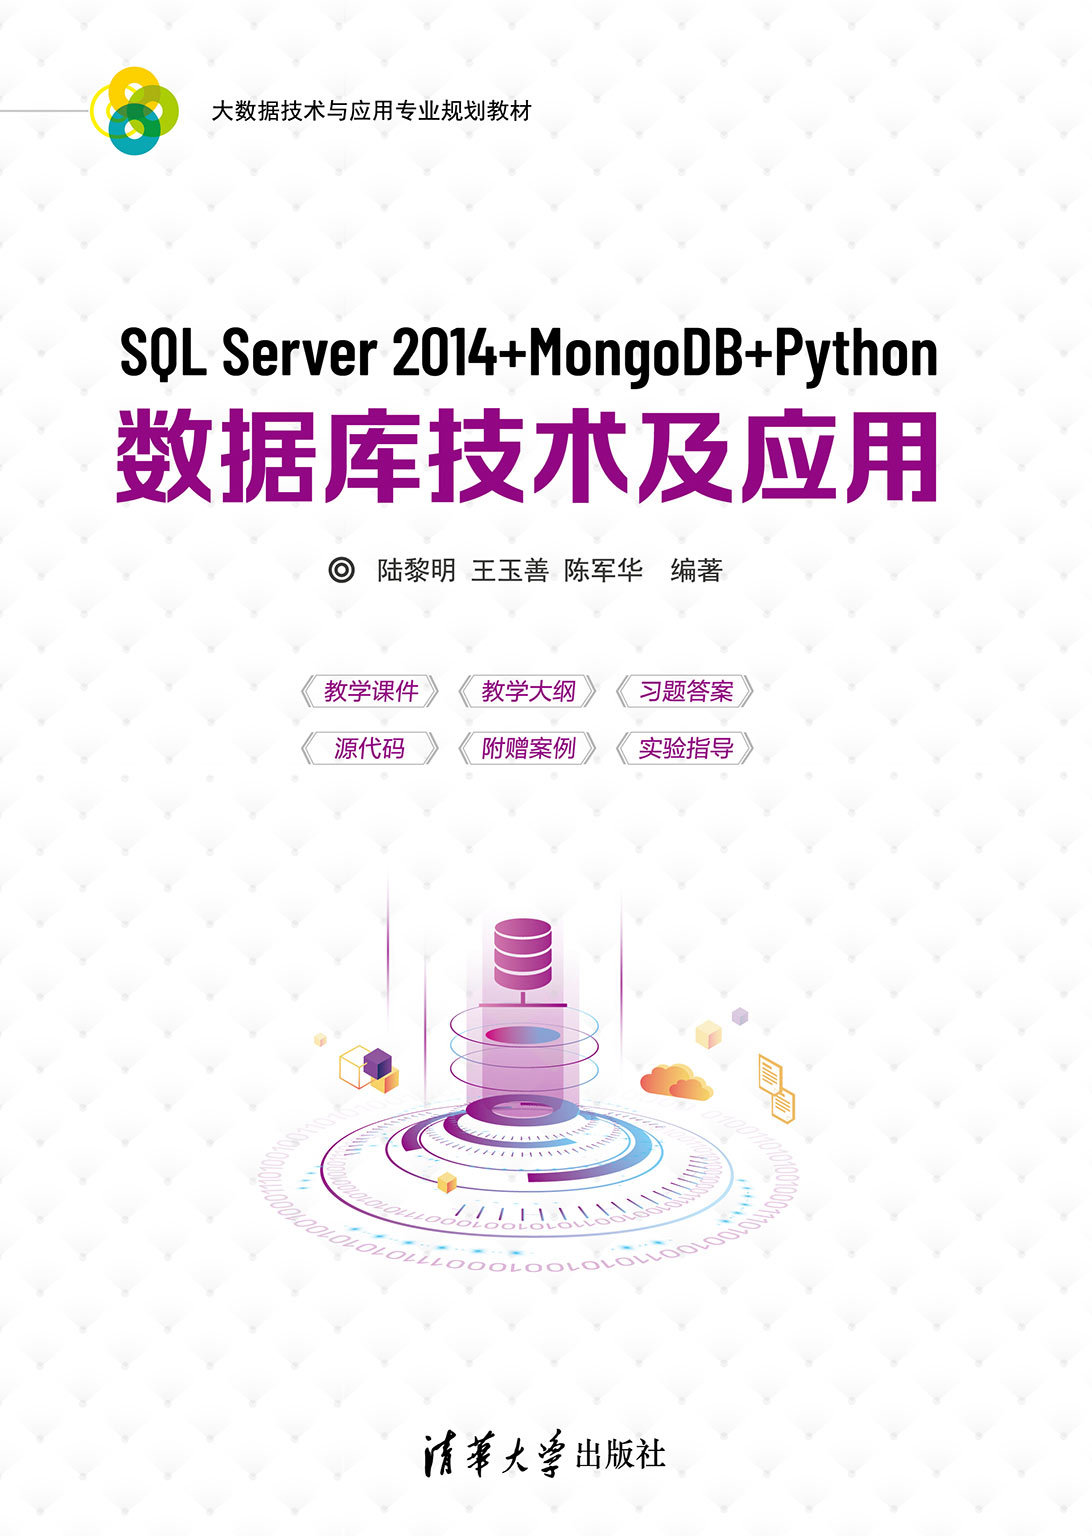 SQL Server 2014+MongoDB+Python數據庫技術及應用-preview-1